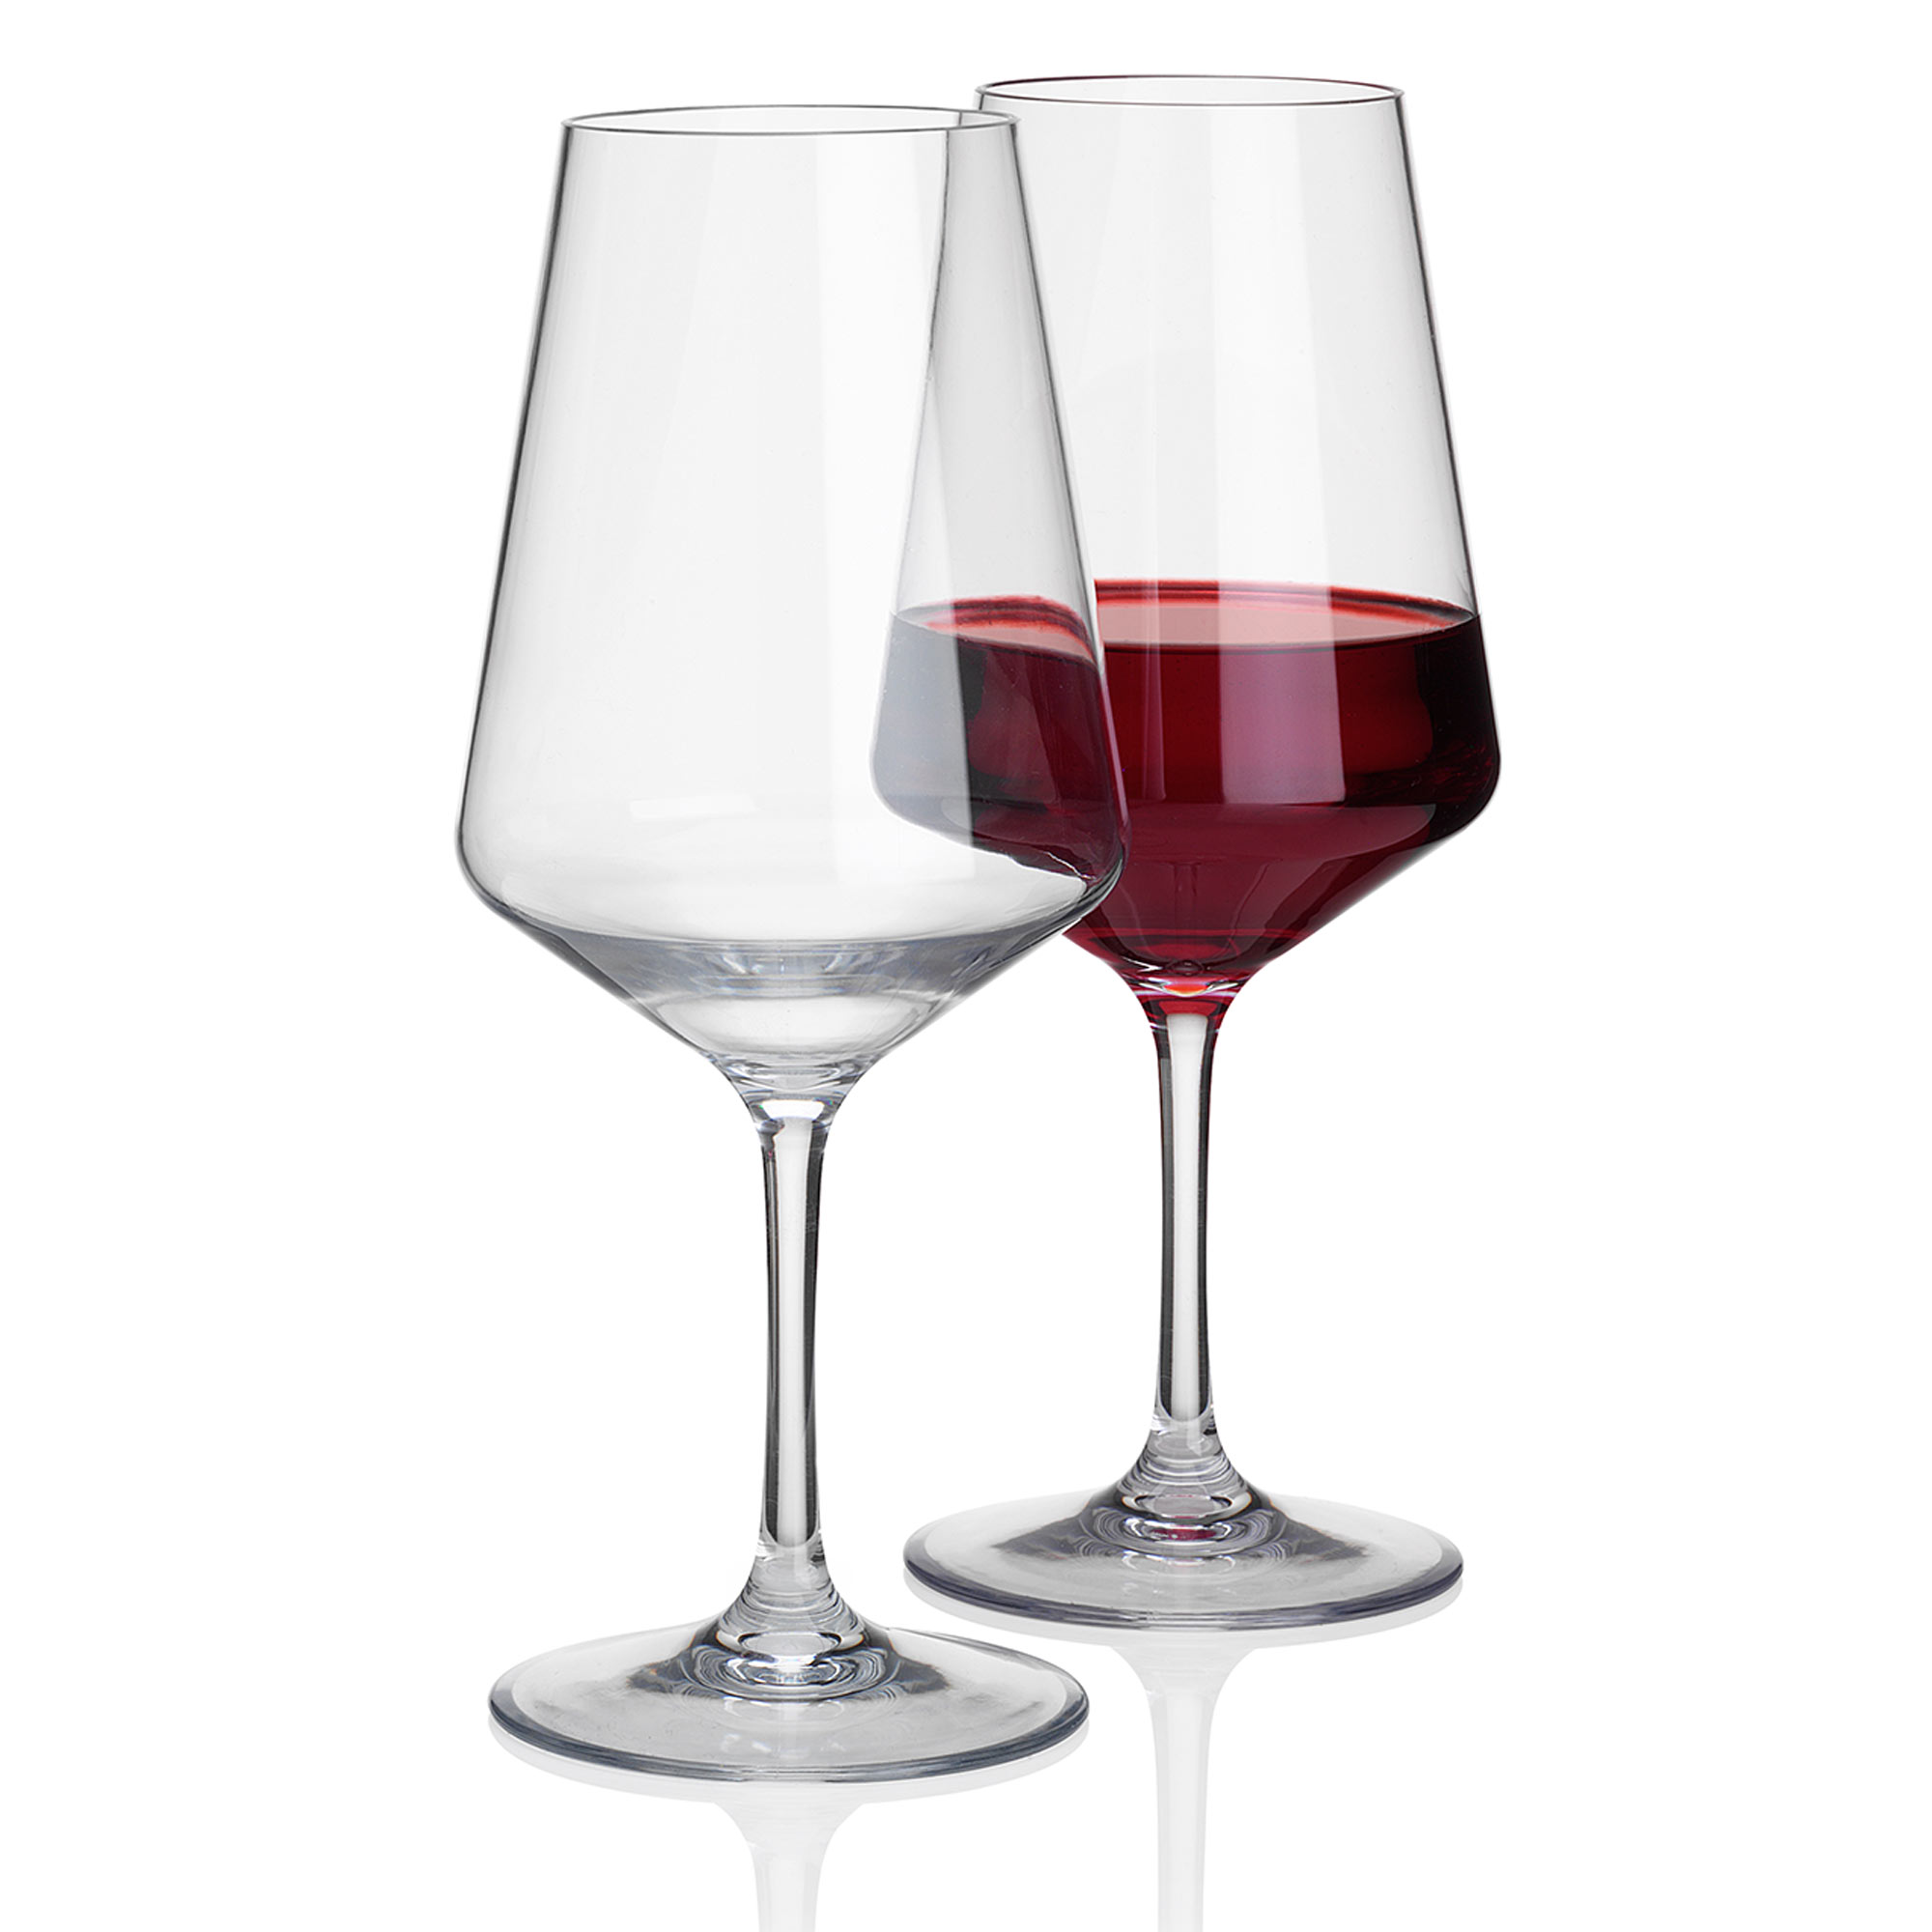 Savoy Large Plastic Wine Glasses 570ml At Drinkstuff